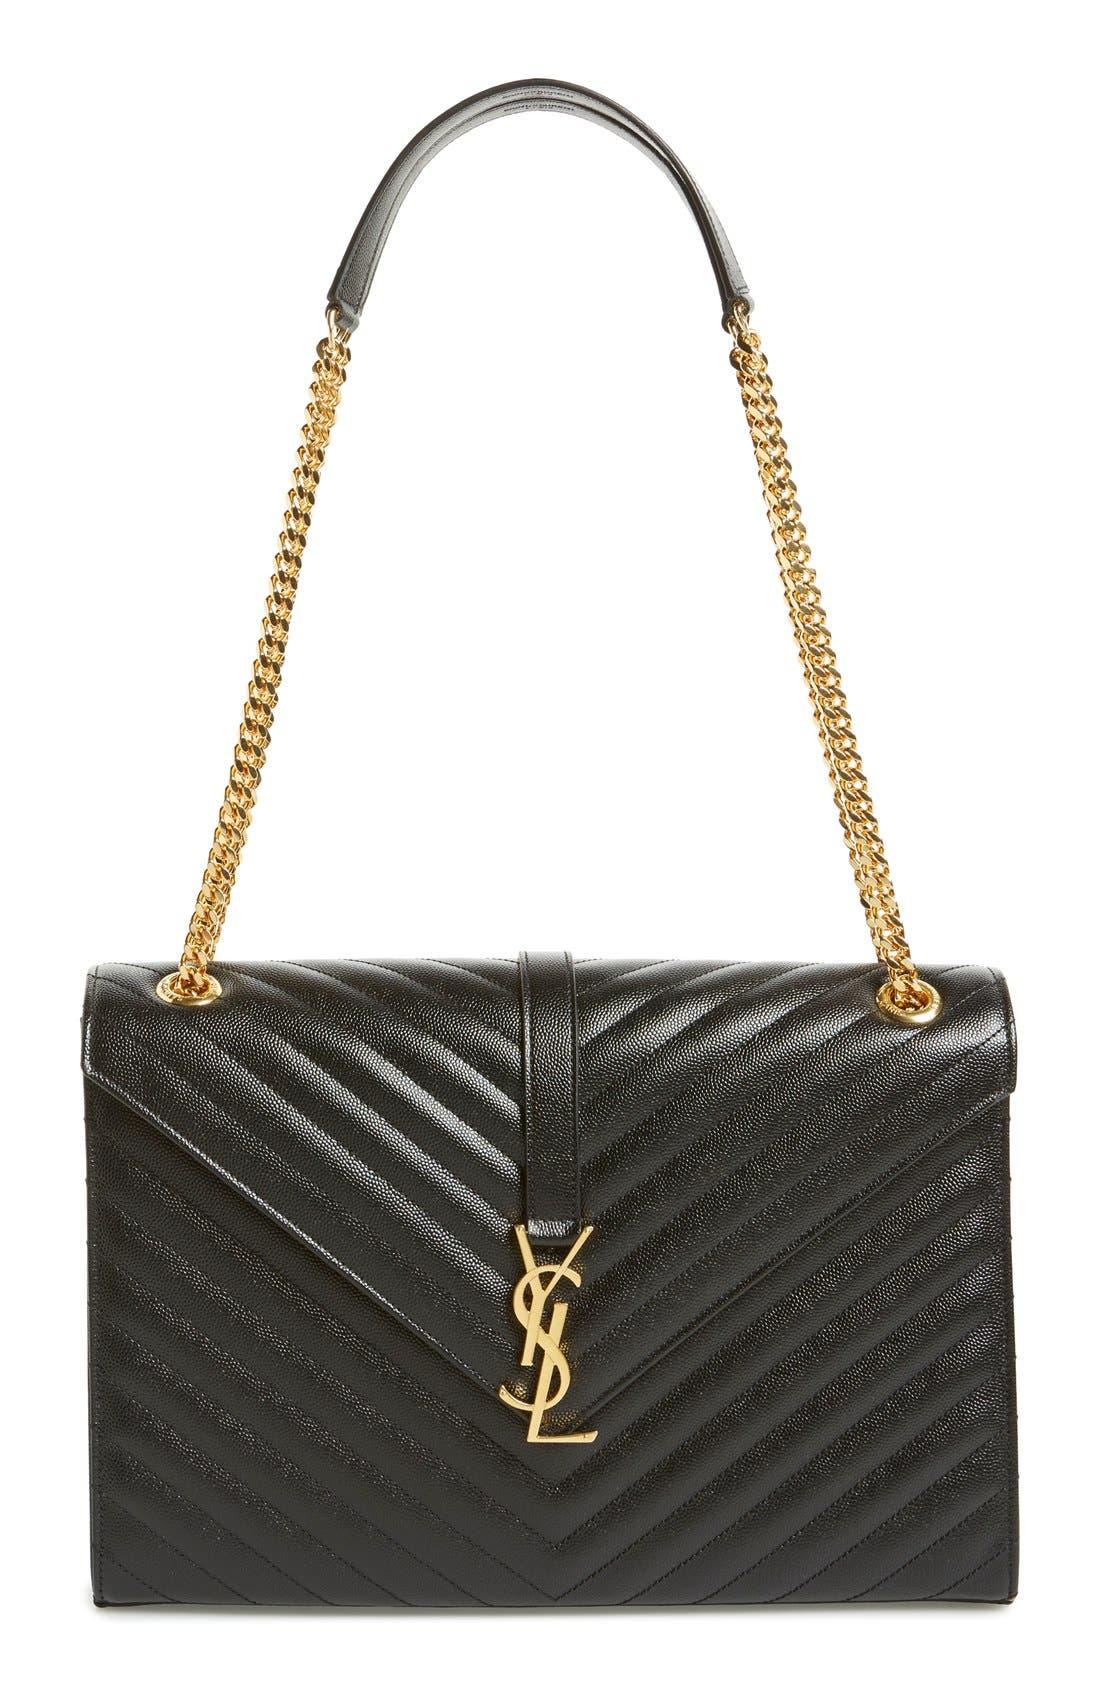 'Large Monogram' Grained Leather Shoulder Bag,                             Main thumbnail 1, color,                             Nero/ Gold Hdwr